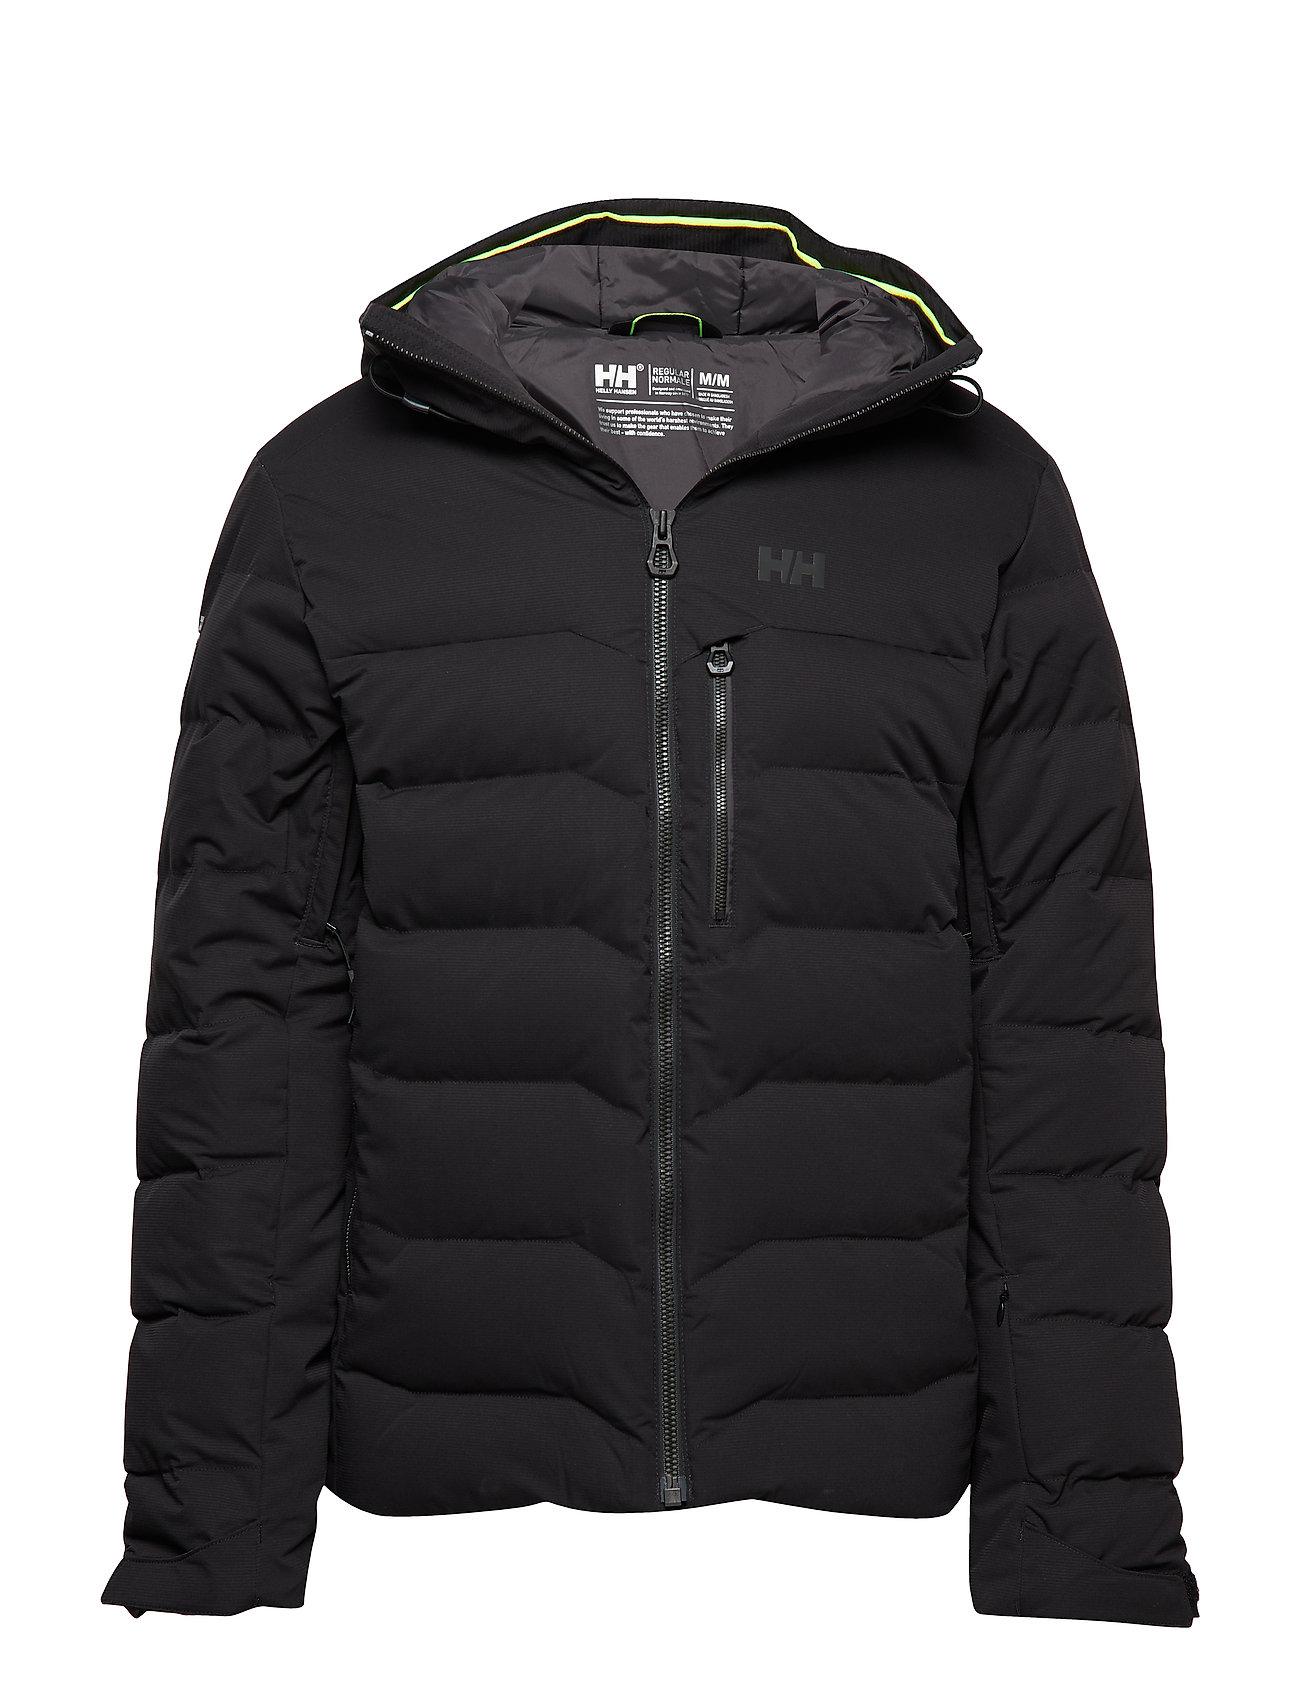 huge discount 5e528 be21b Swift Loft Jacket | Kleidung günstig kaufen | foccz.com